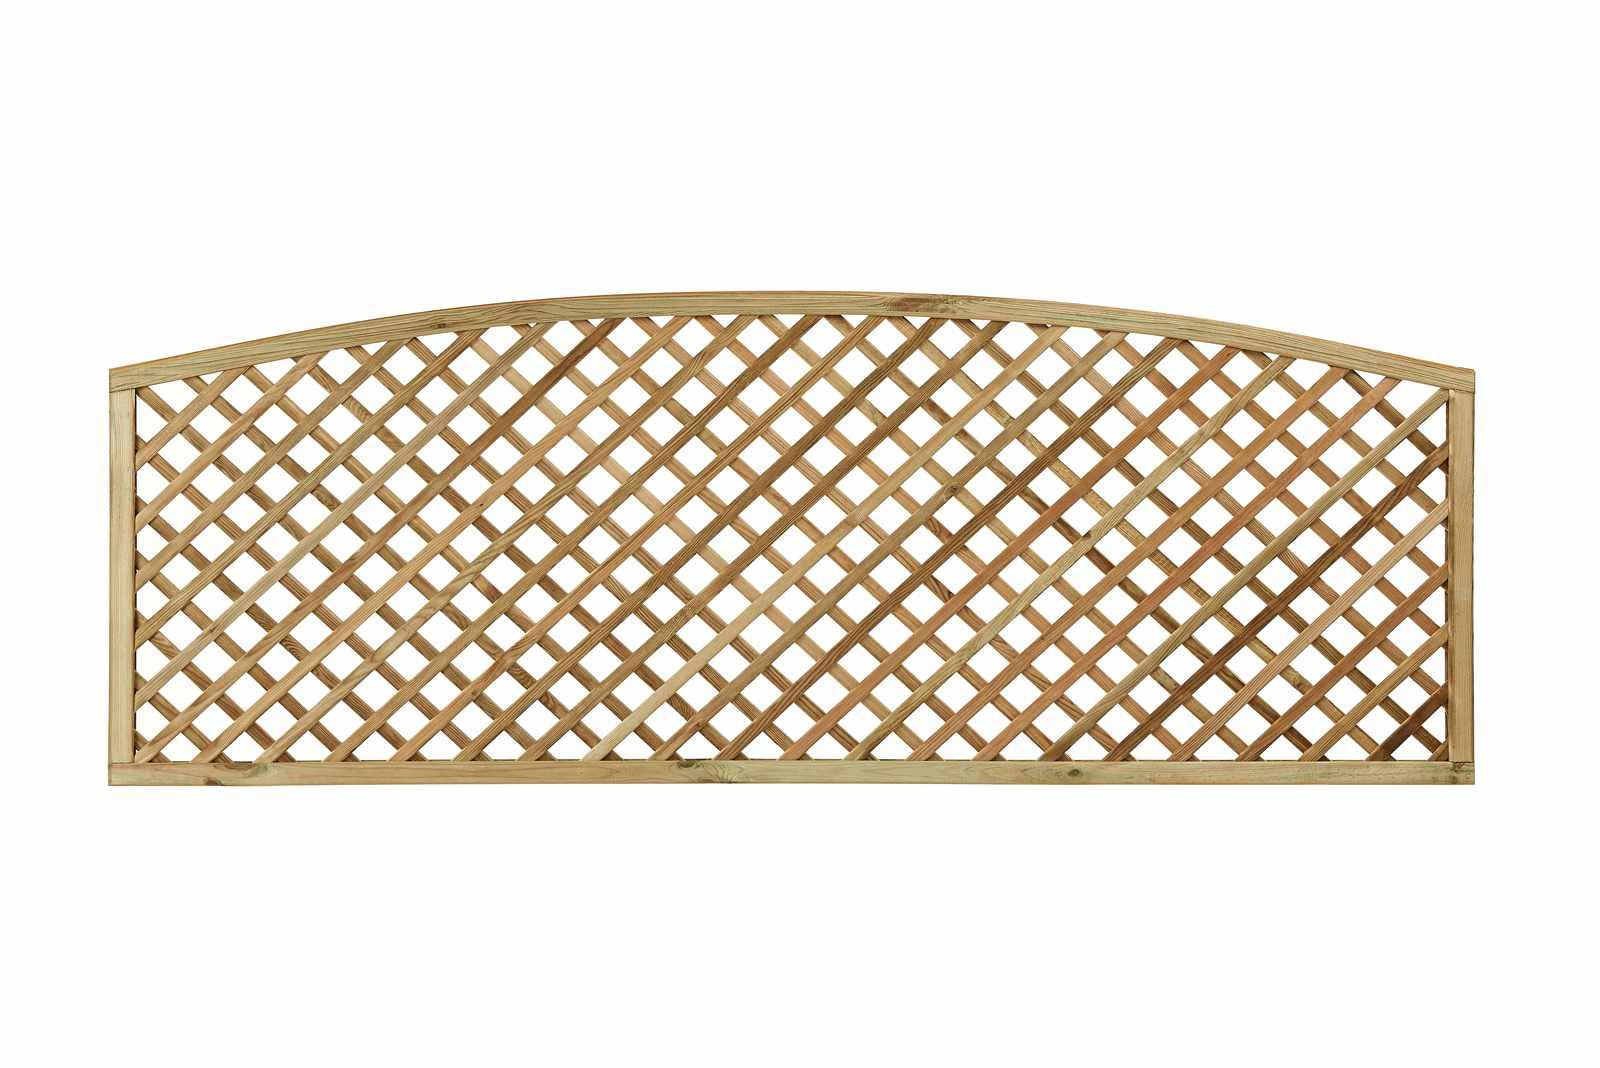 Diagonal Trellis Convex Arched Topper Panel